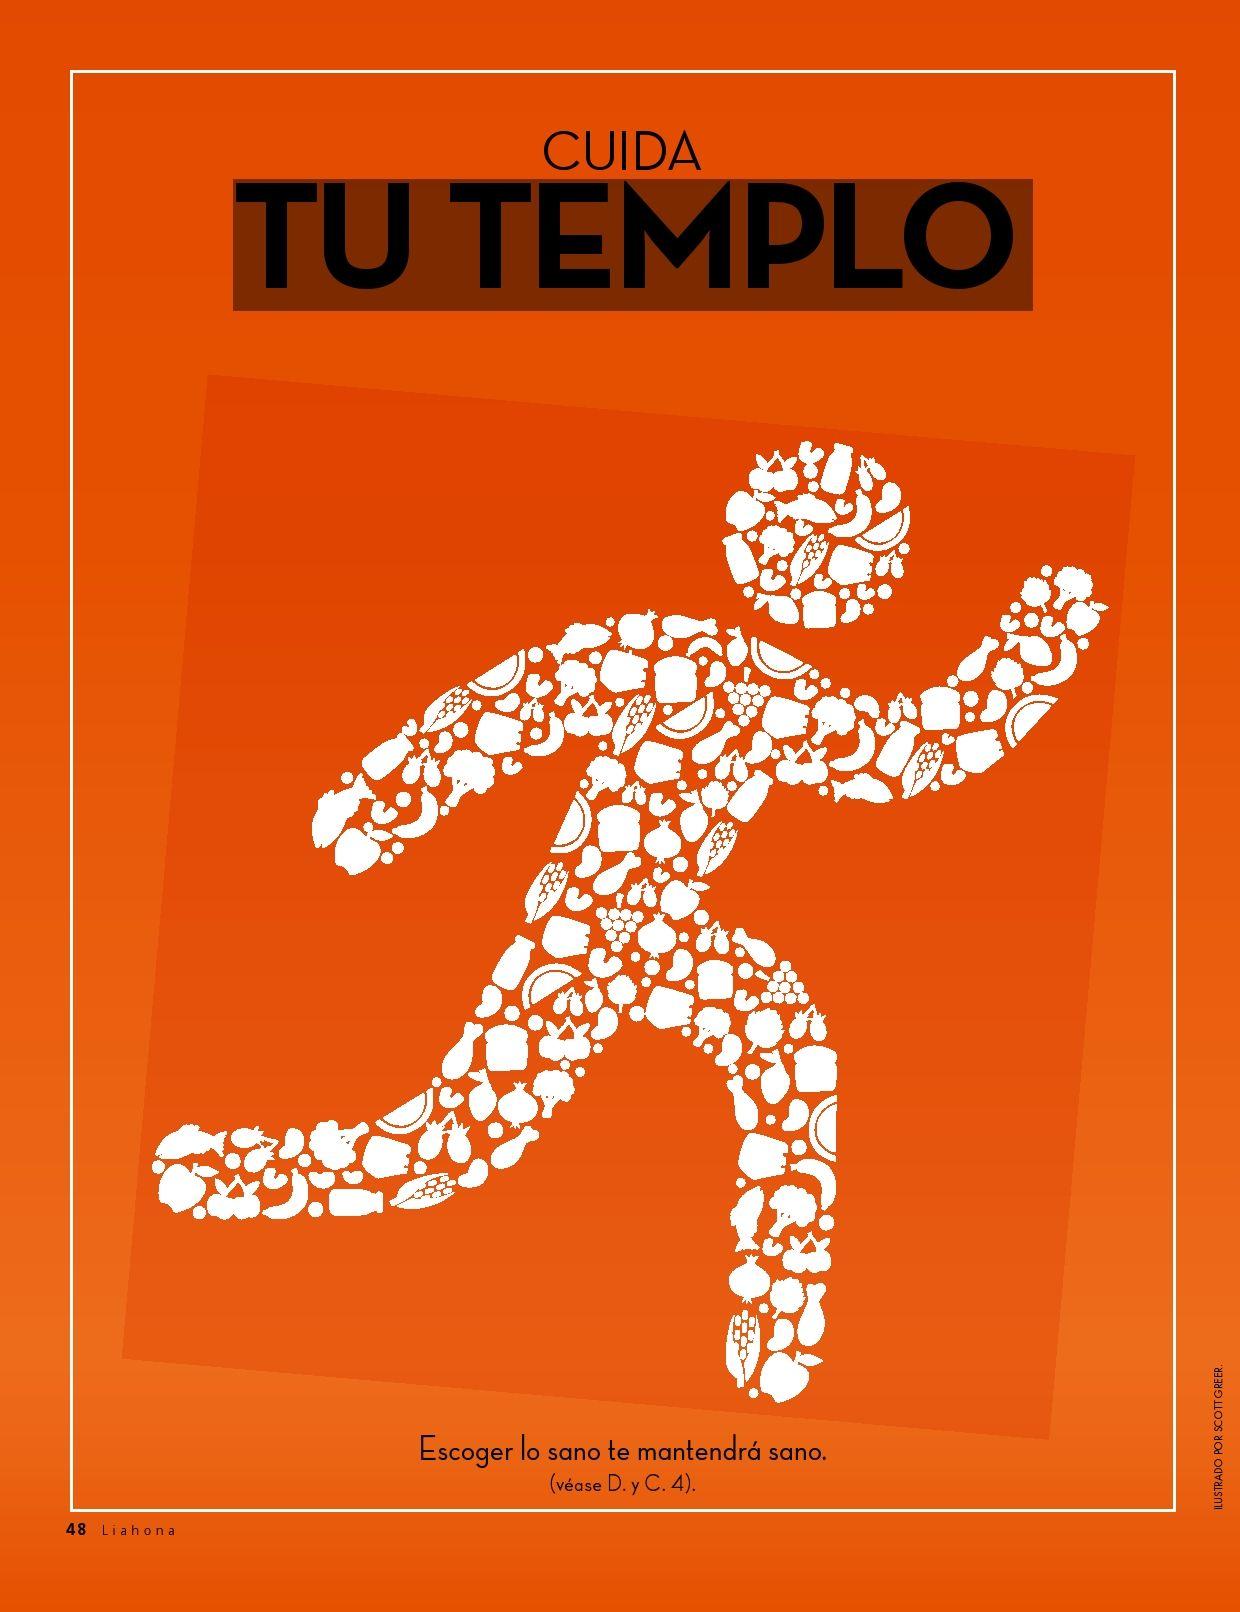 lds #mormons #spanish #liahona #sud Español www.lds.org/liahona ...